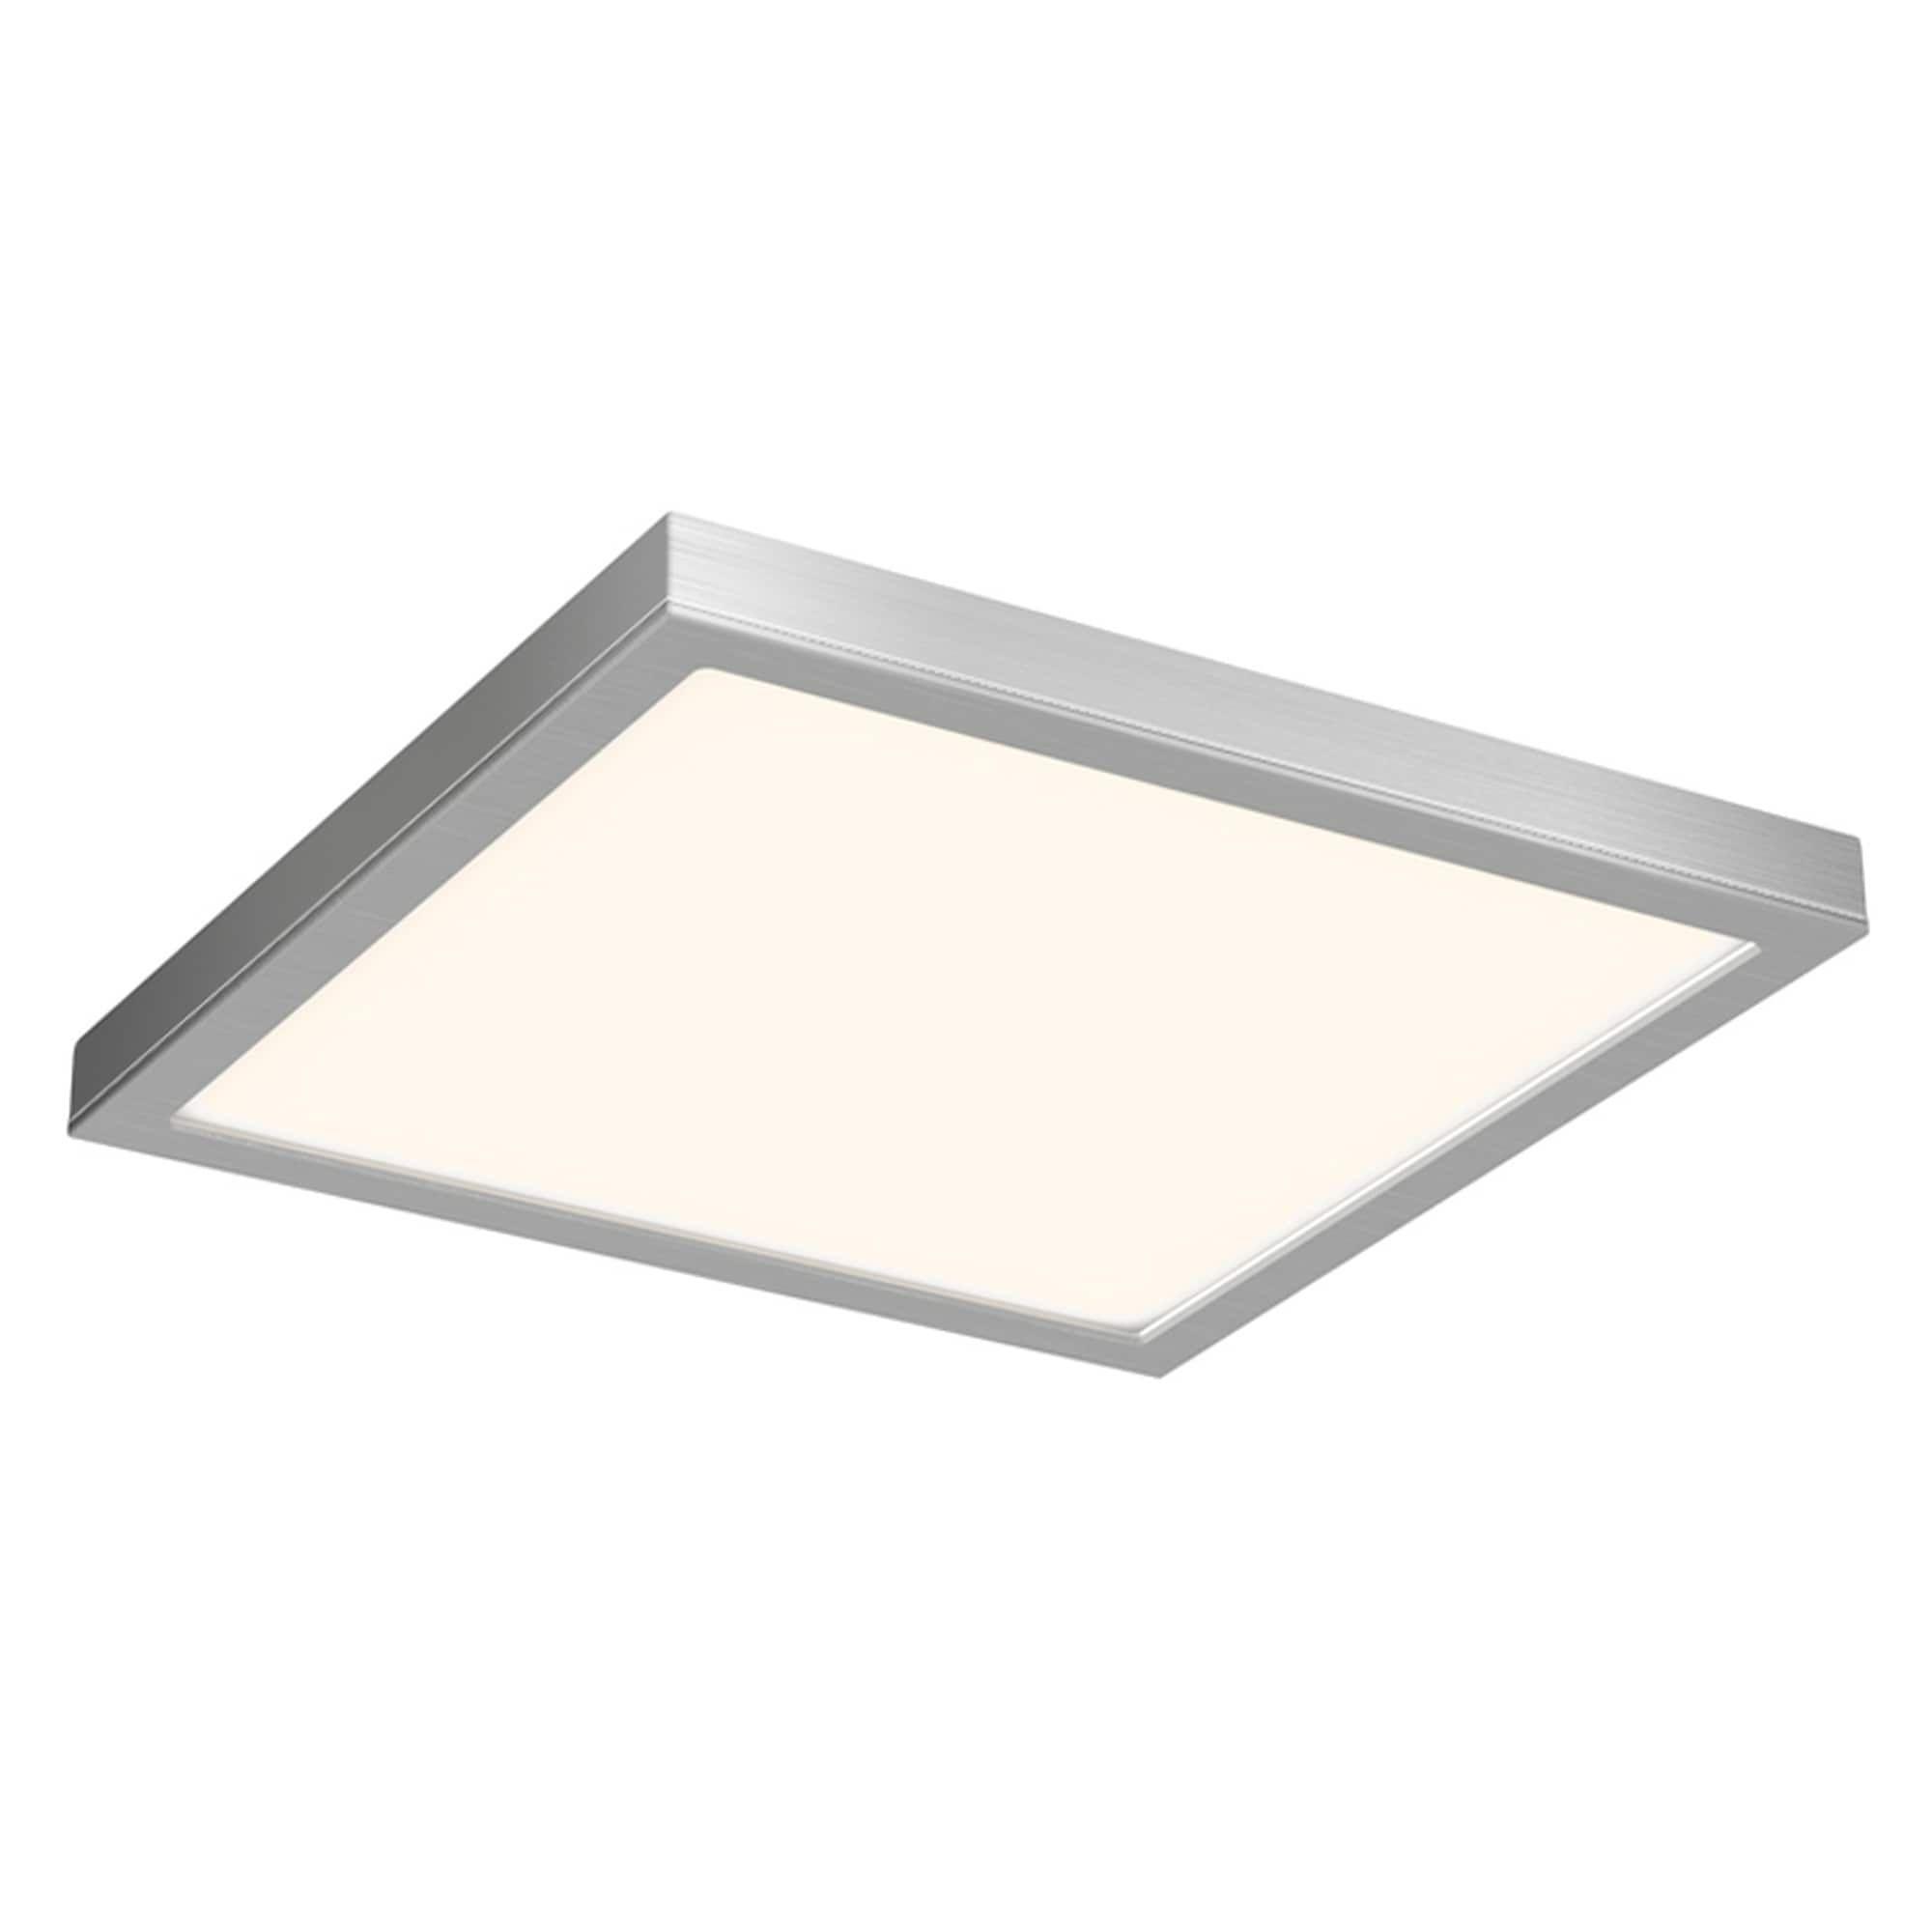 Dals Lighting Indoor Outdoor 14 Inch Square Led Flush Mount 14 Quot In 2020 Led Flush Mount Led